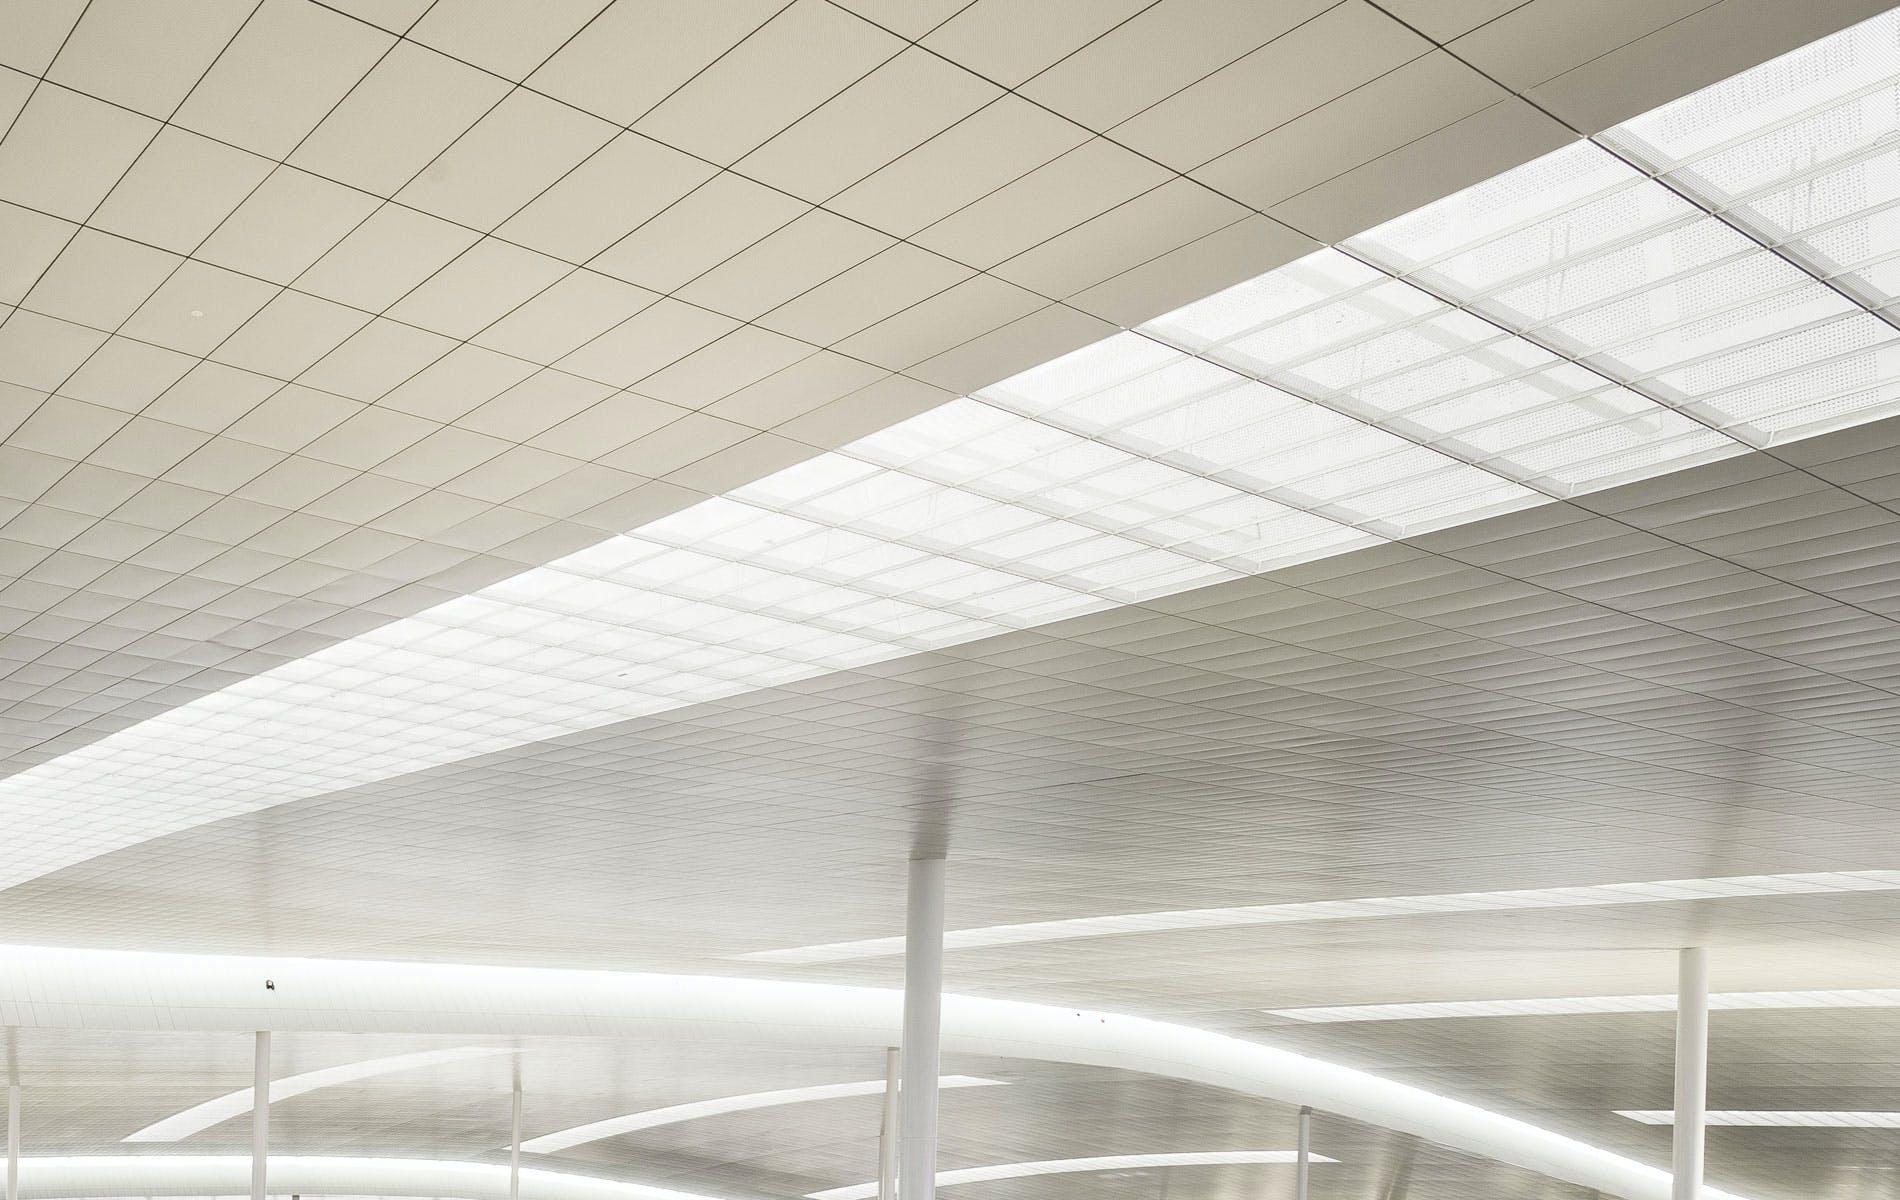 Terminal i at barcelona airport ricardo bofill taller de for La porte city iowa city hall